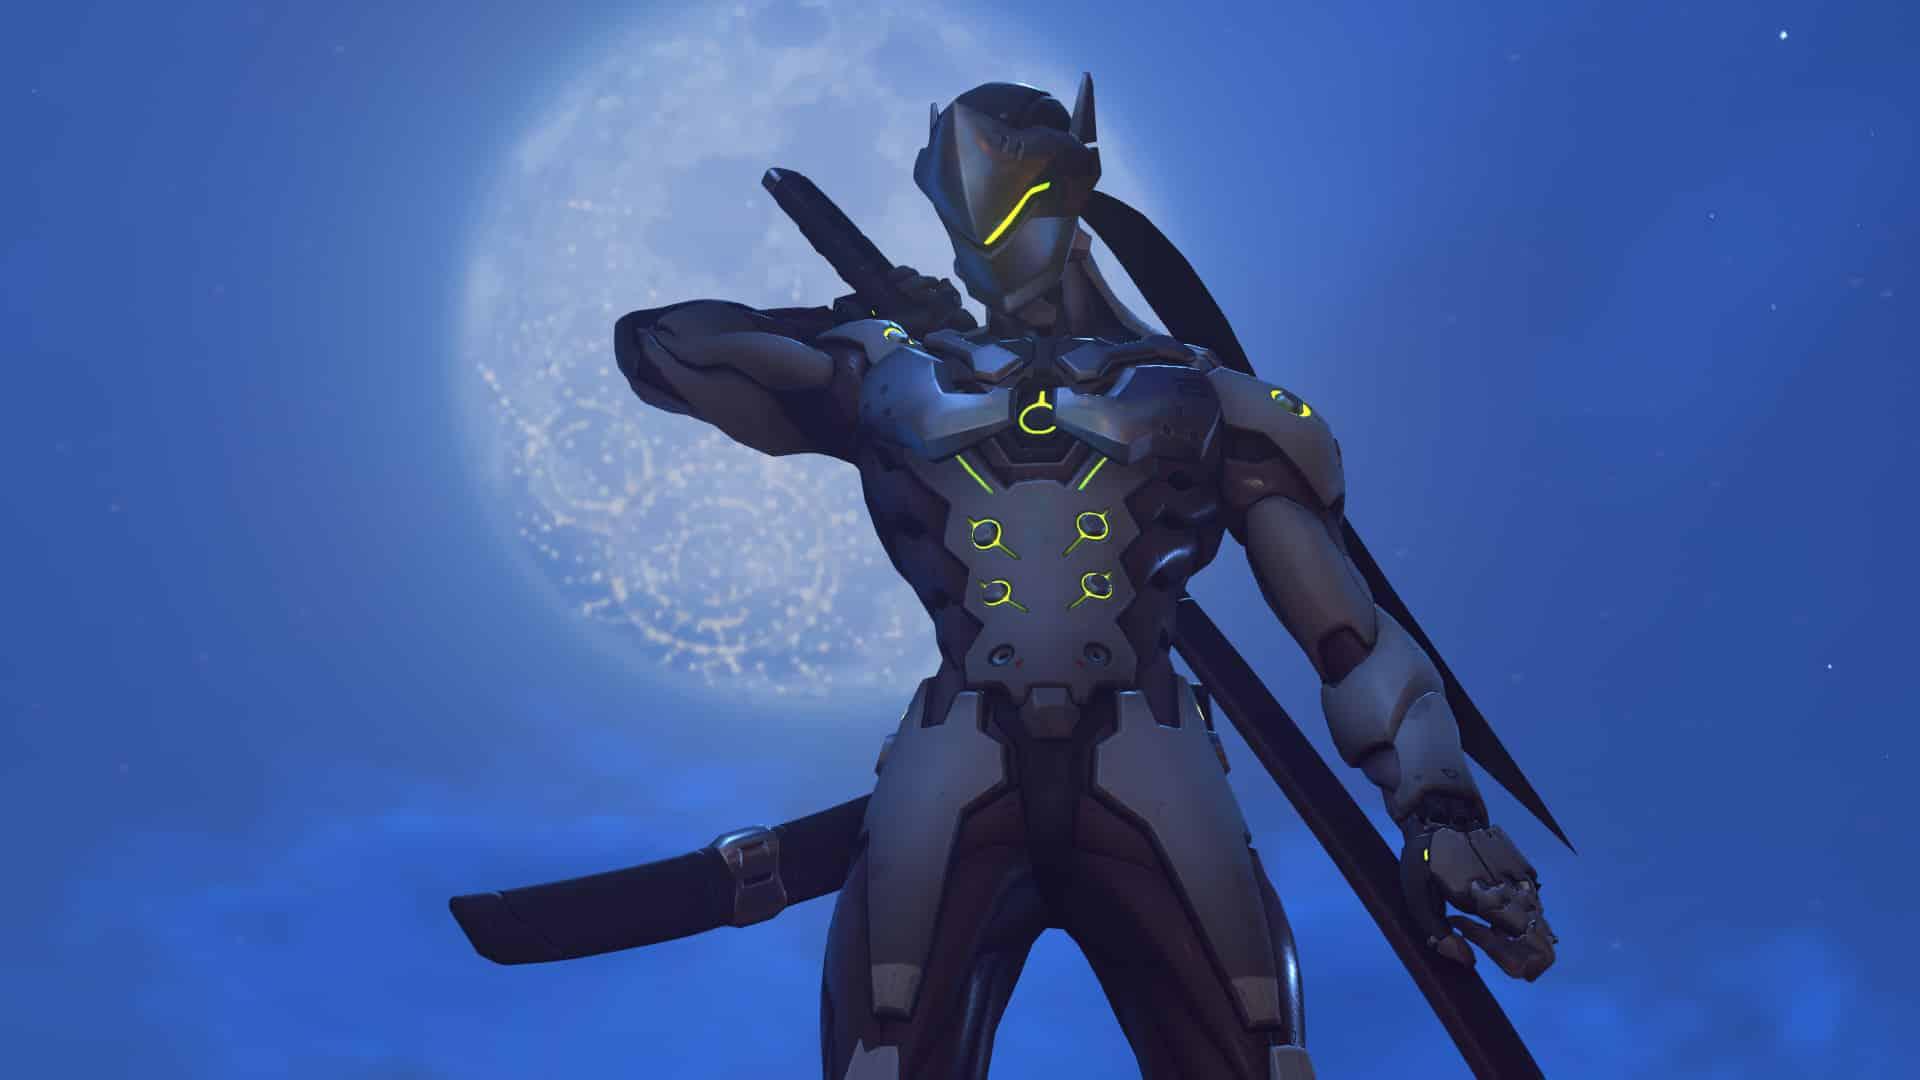 overwatch genji - Overwatch: Parte l'ottava stagione competitiva